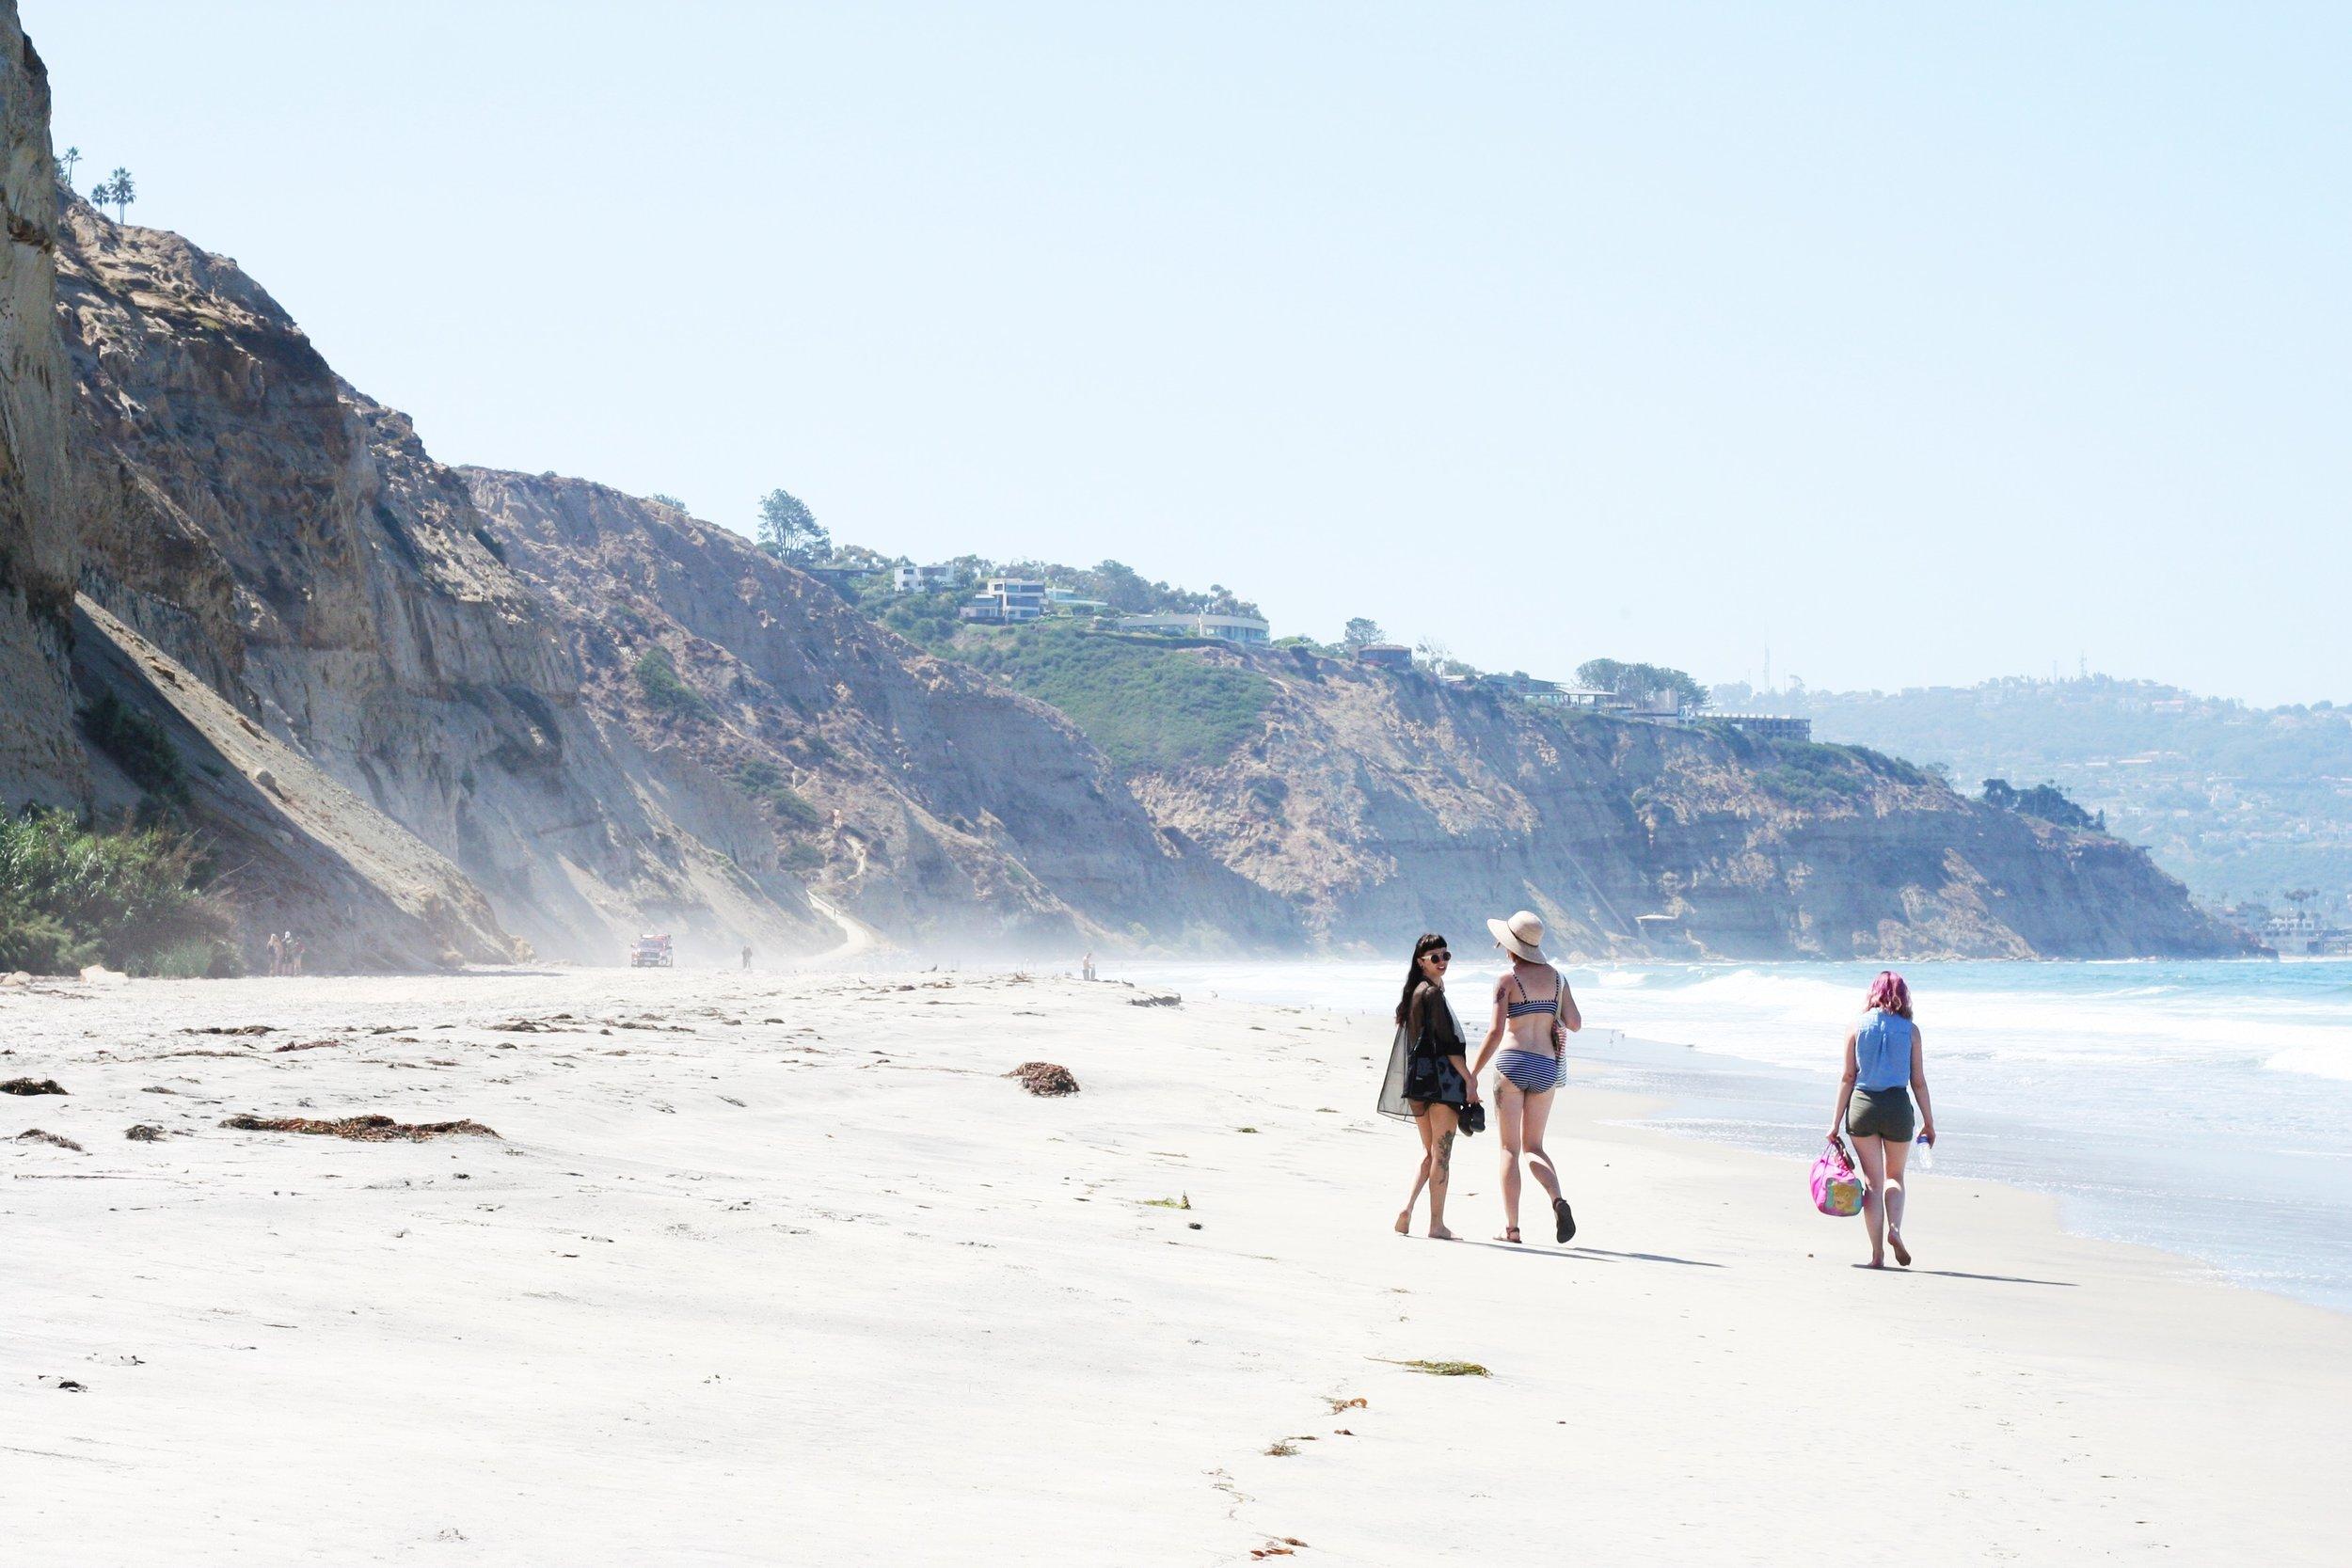 Day 1, Black's Beach